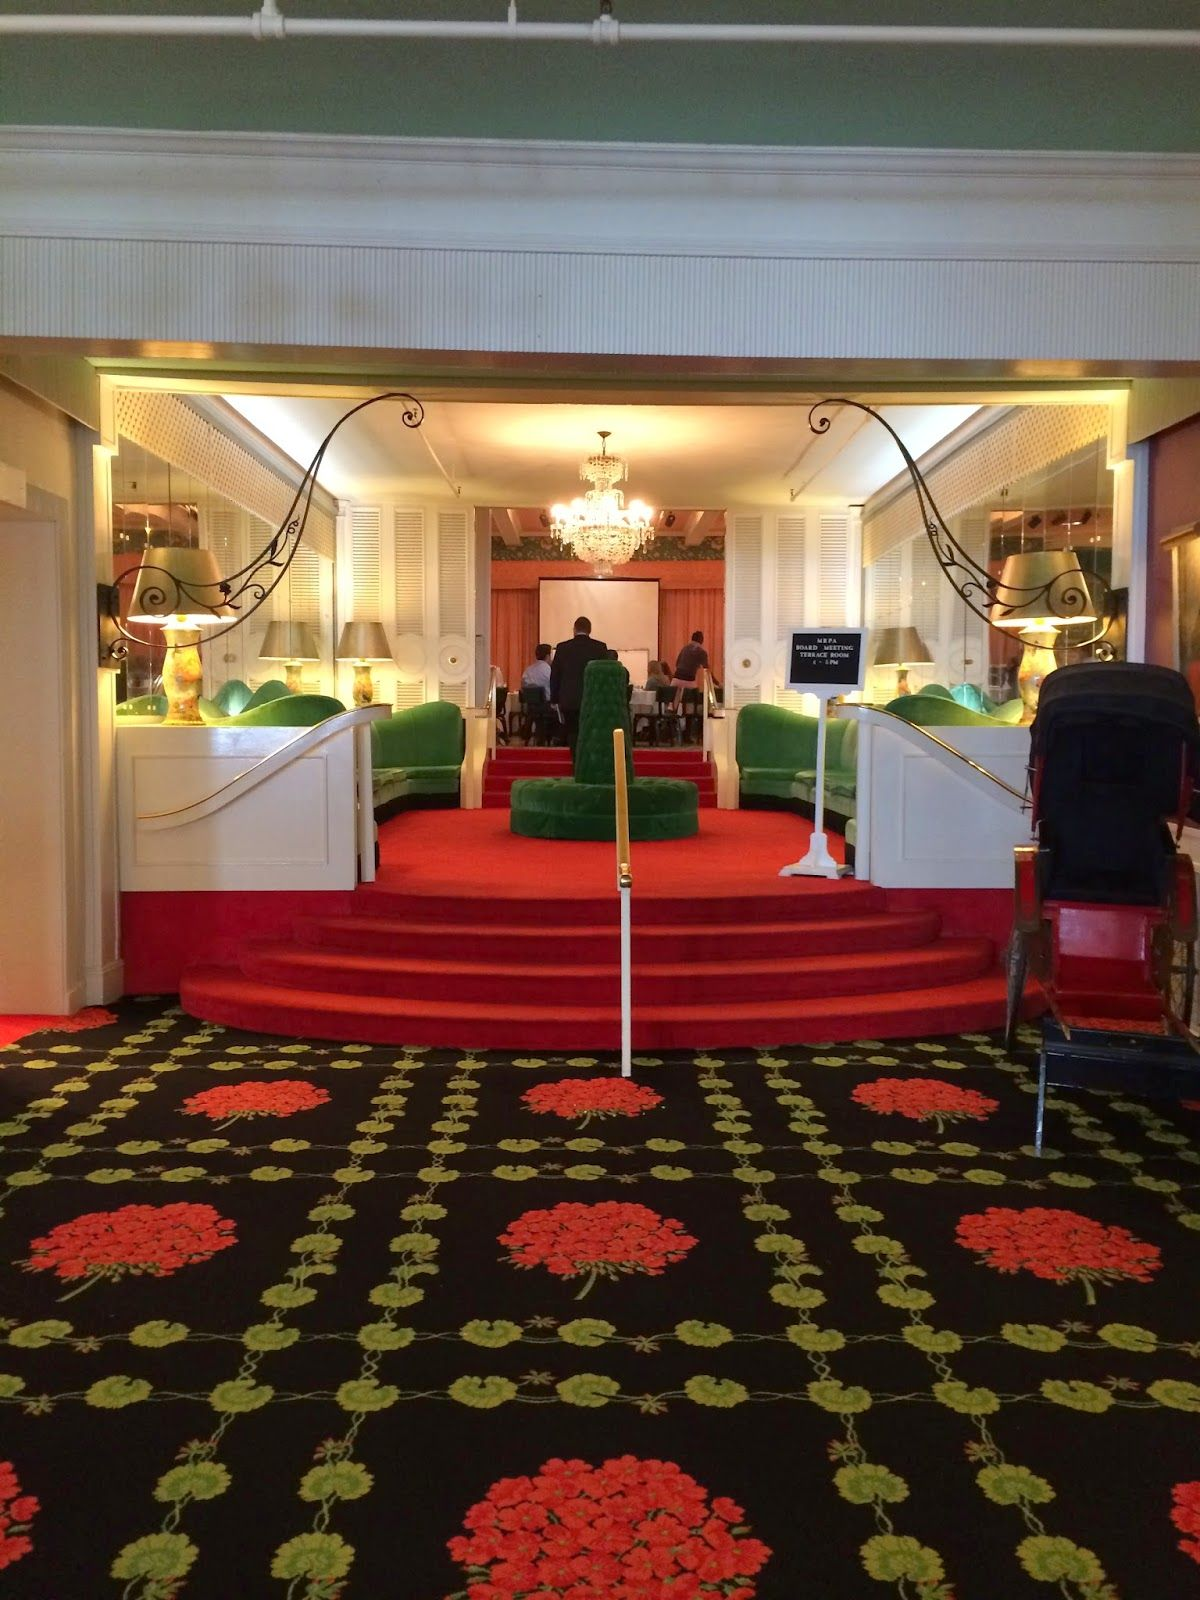 Christa Pirl Furniture Interiors At The Grand Grand Hotel Mackinac Island Mackinac Island Michigan Mackinac Island